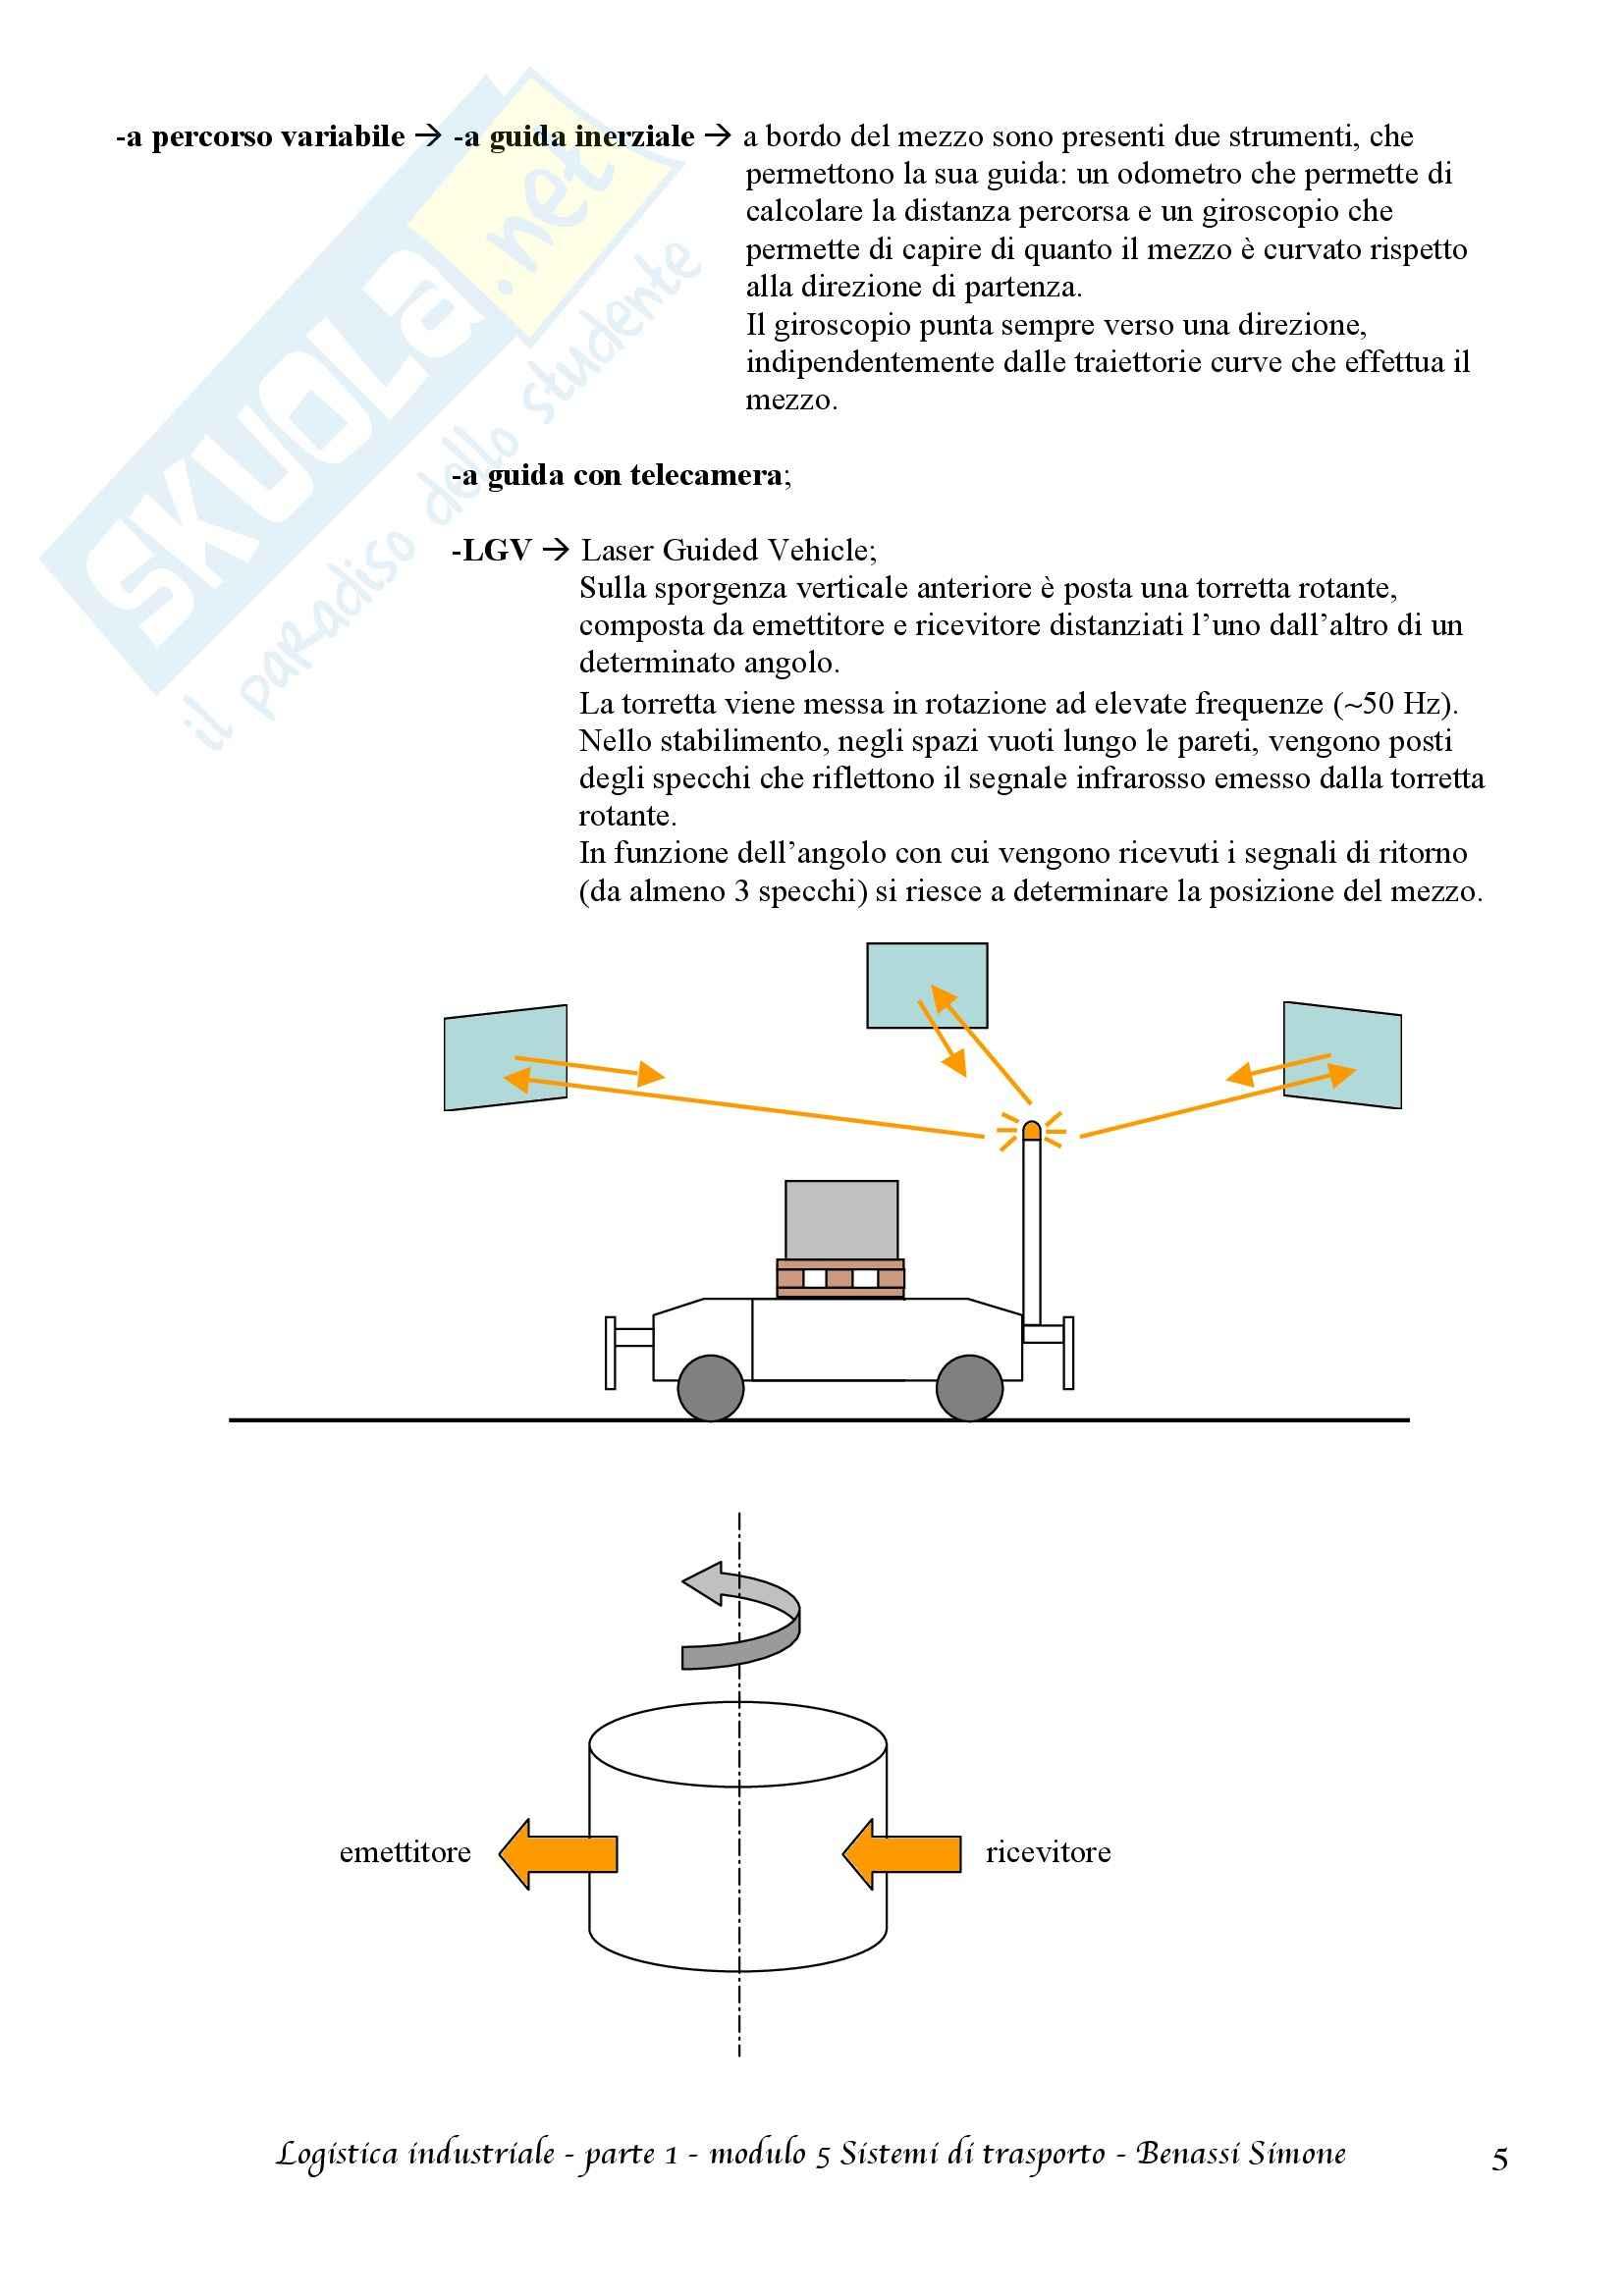 Logistica industriale T-AB - Appunti prima parte Pag. 31